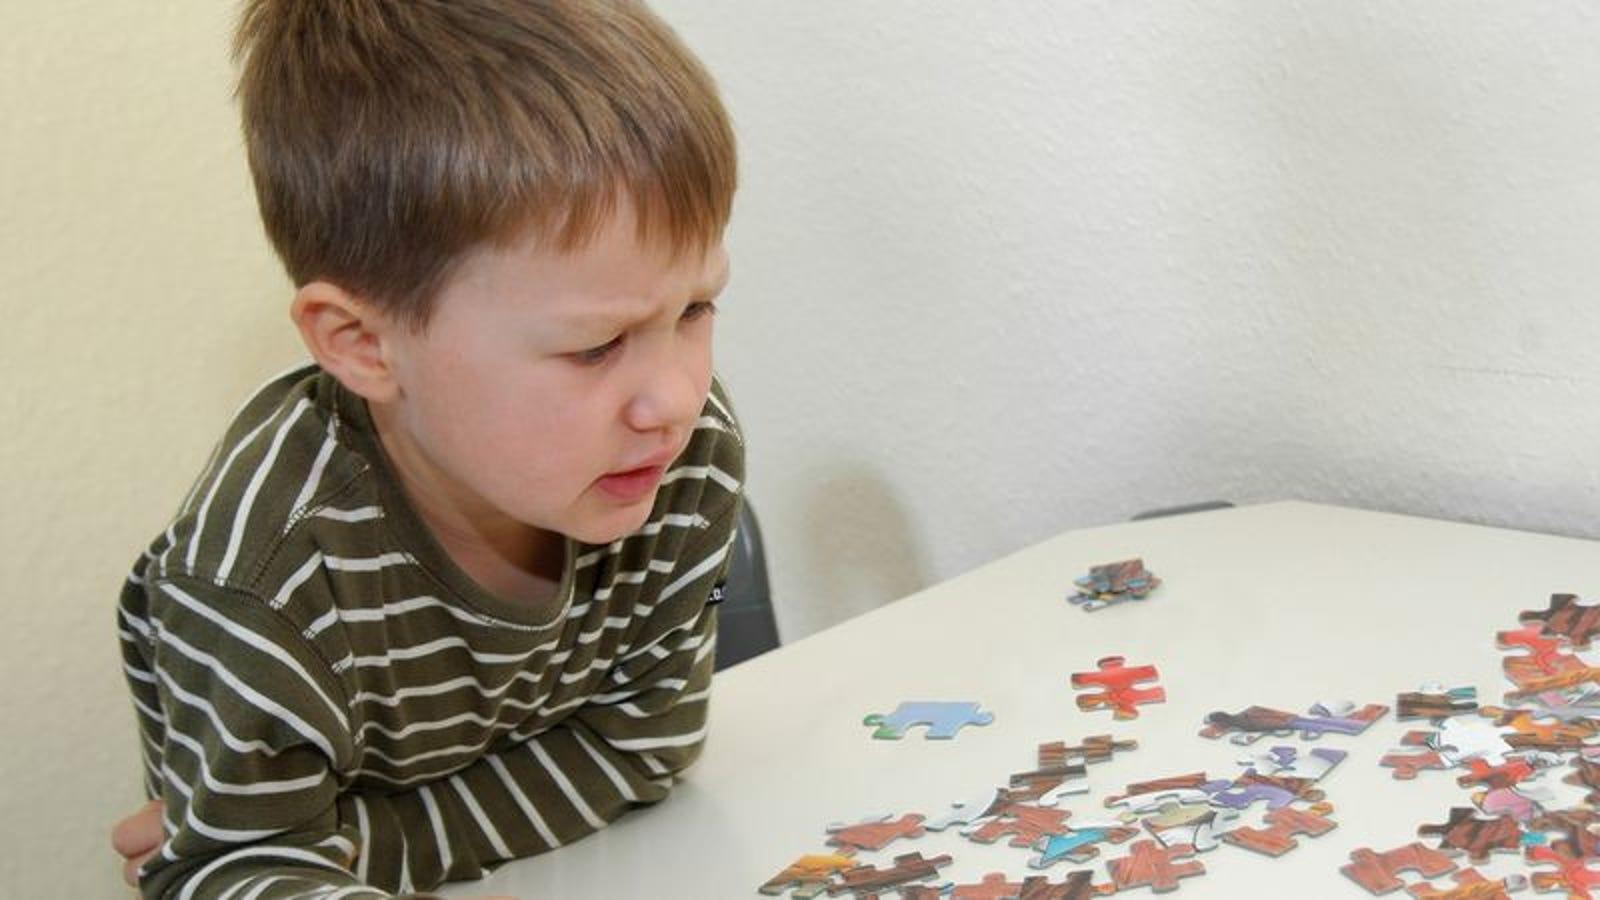 Grandson's Jigsaw Puzzle Strategy Fucking Pathetic